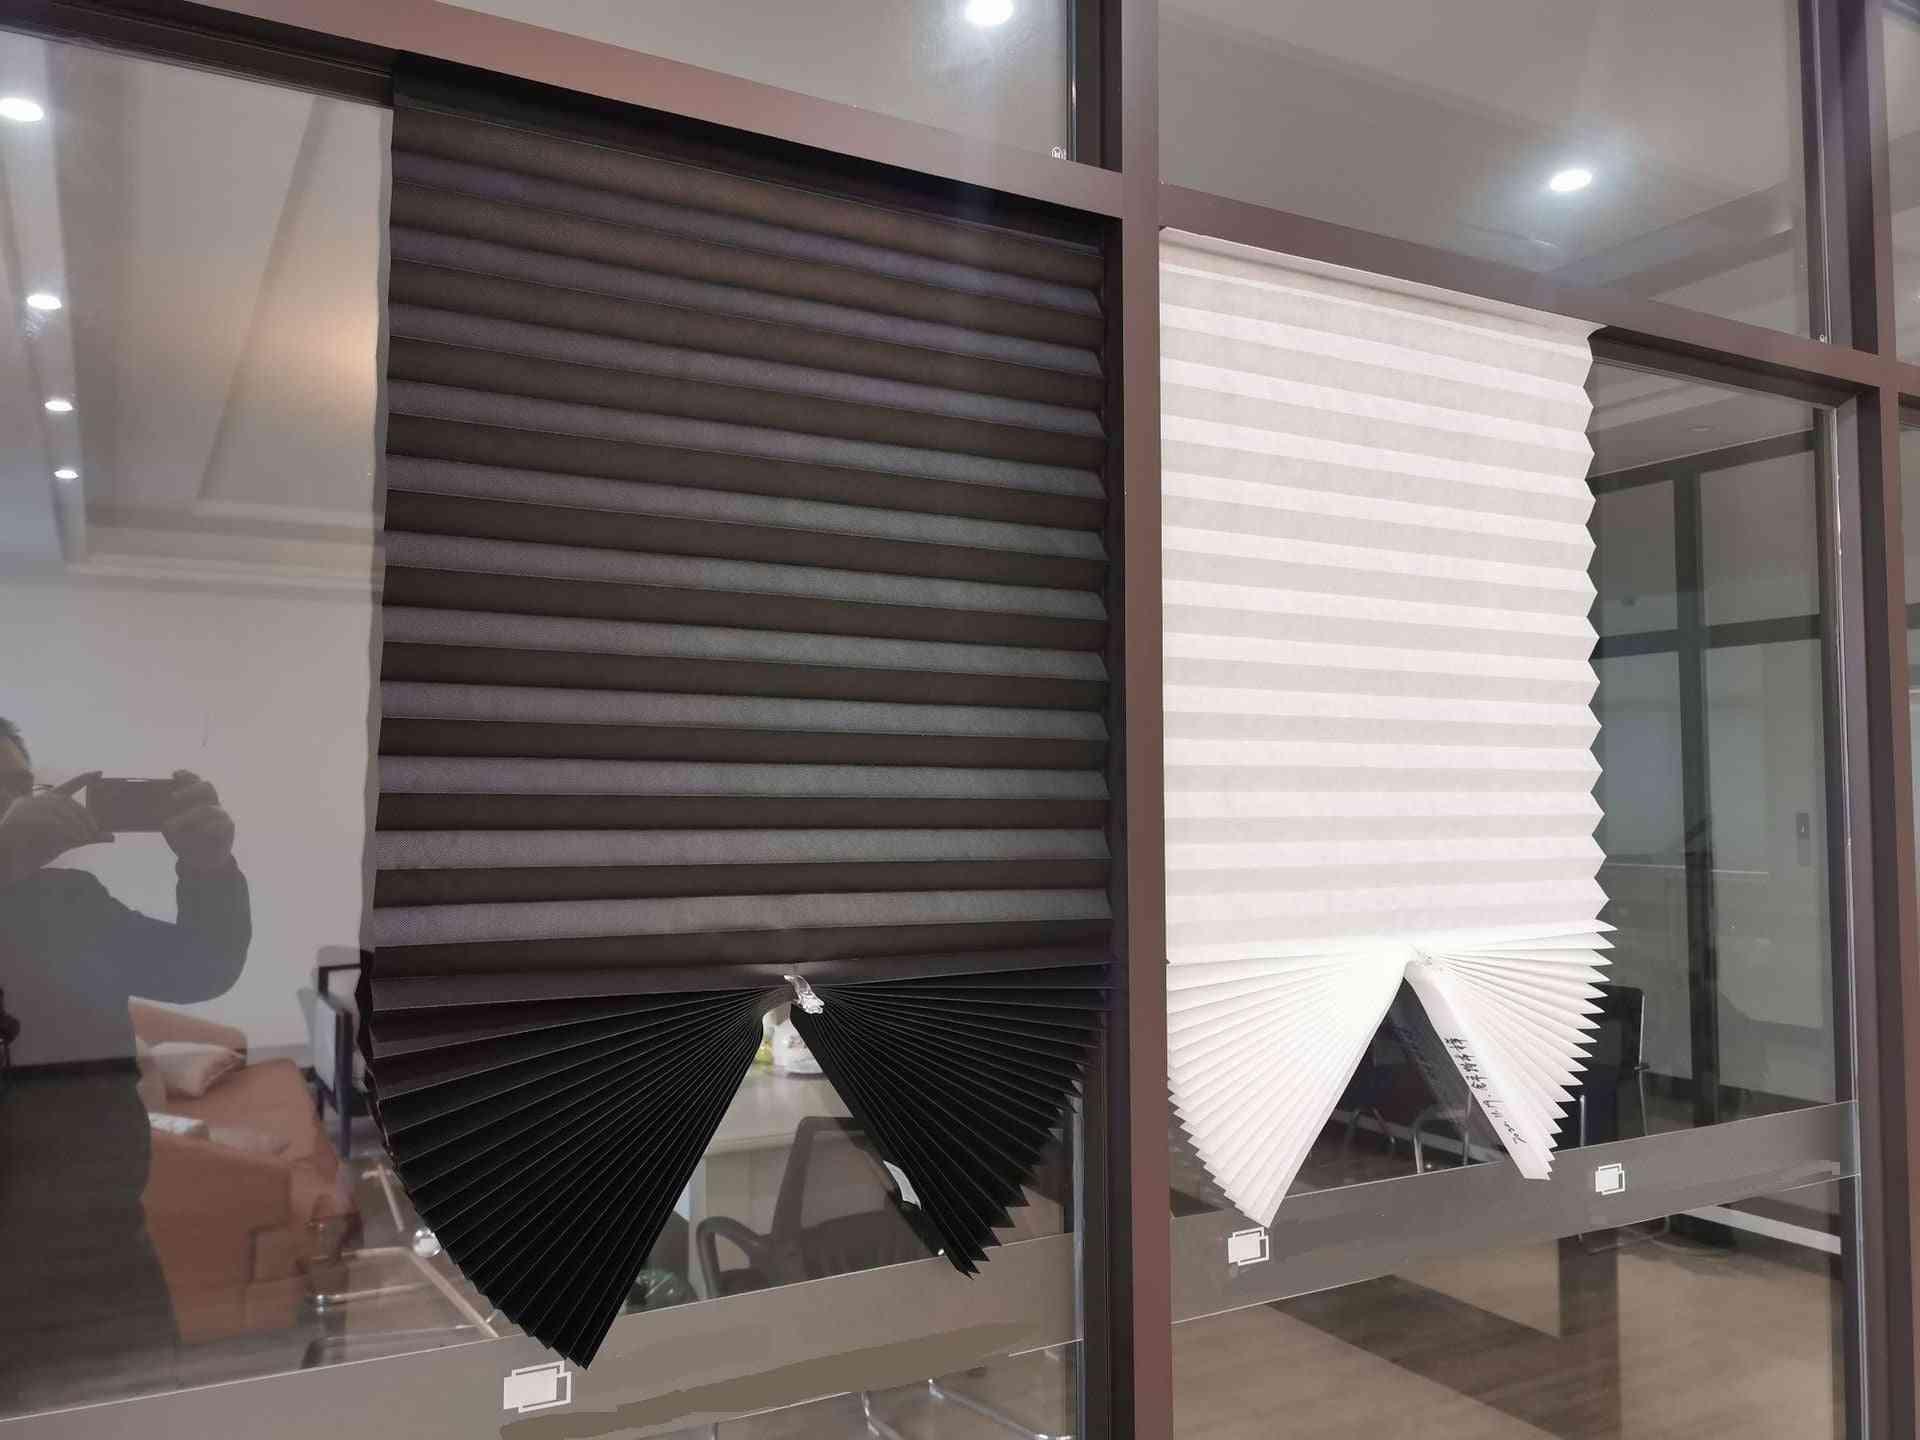 Cordless Pleated Light Blocking Shade / Curtain Blackout